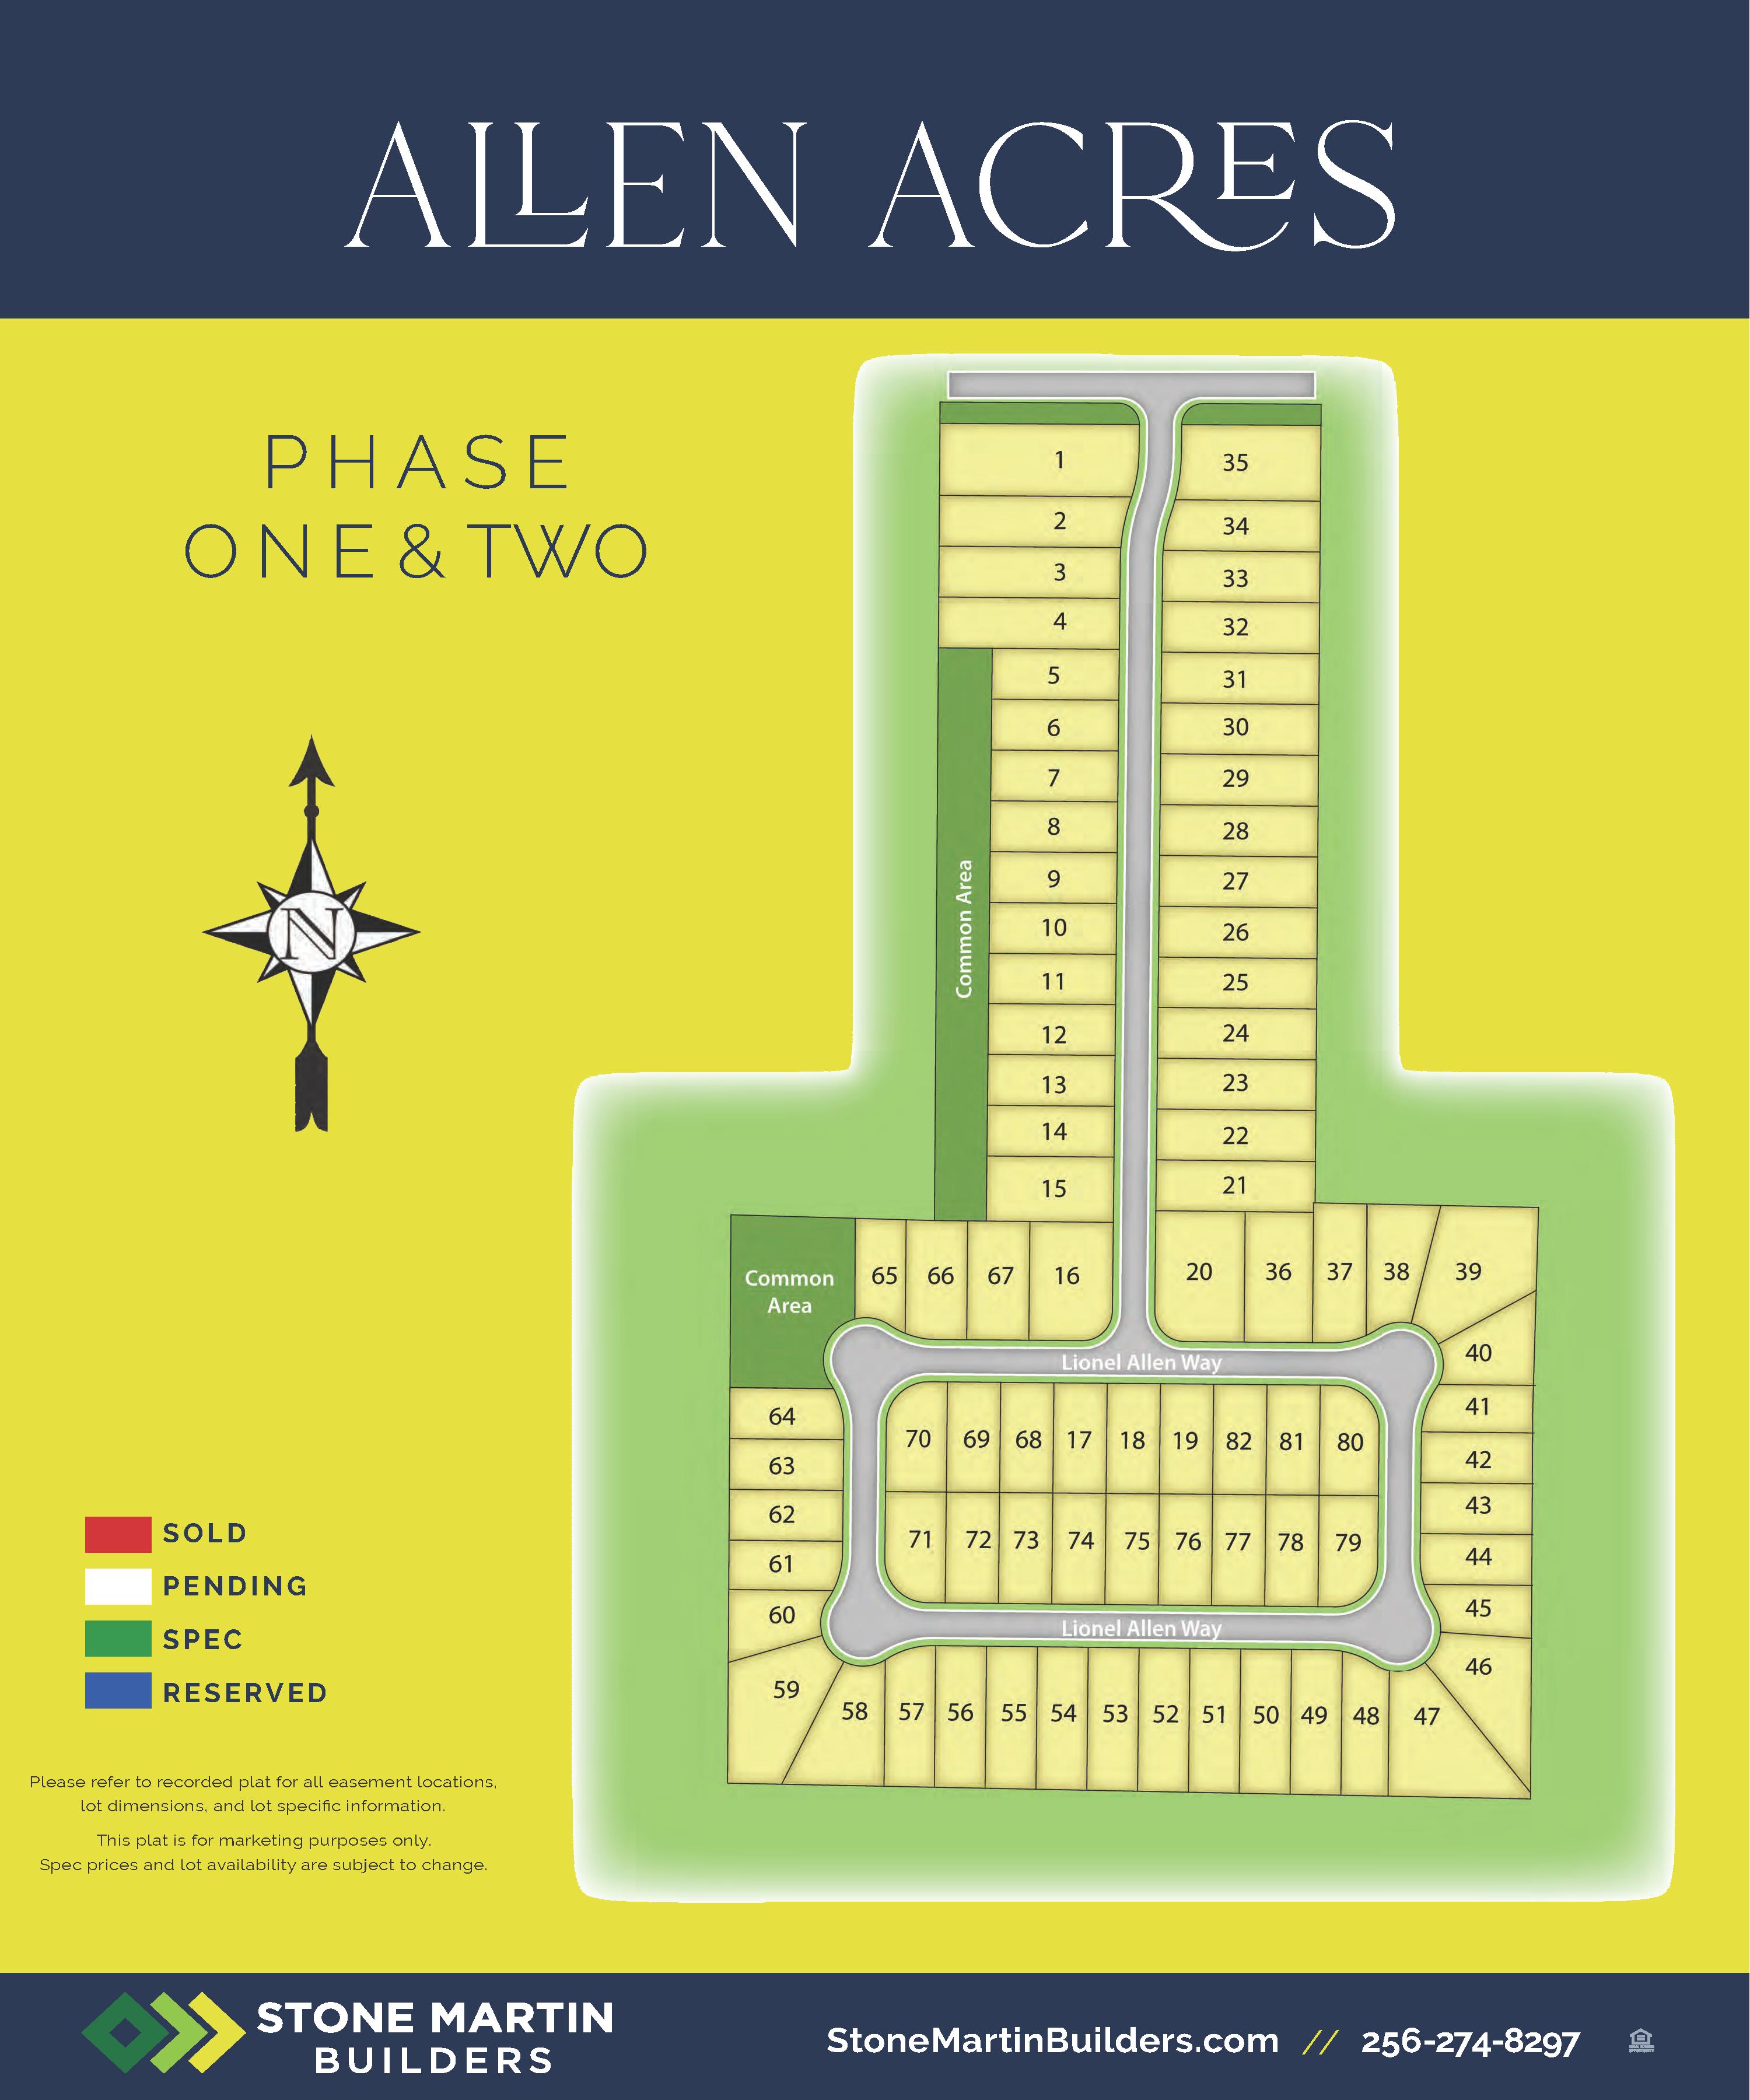 Huntsville, AL Allen Acres New Homes from Stone Martin Builders